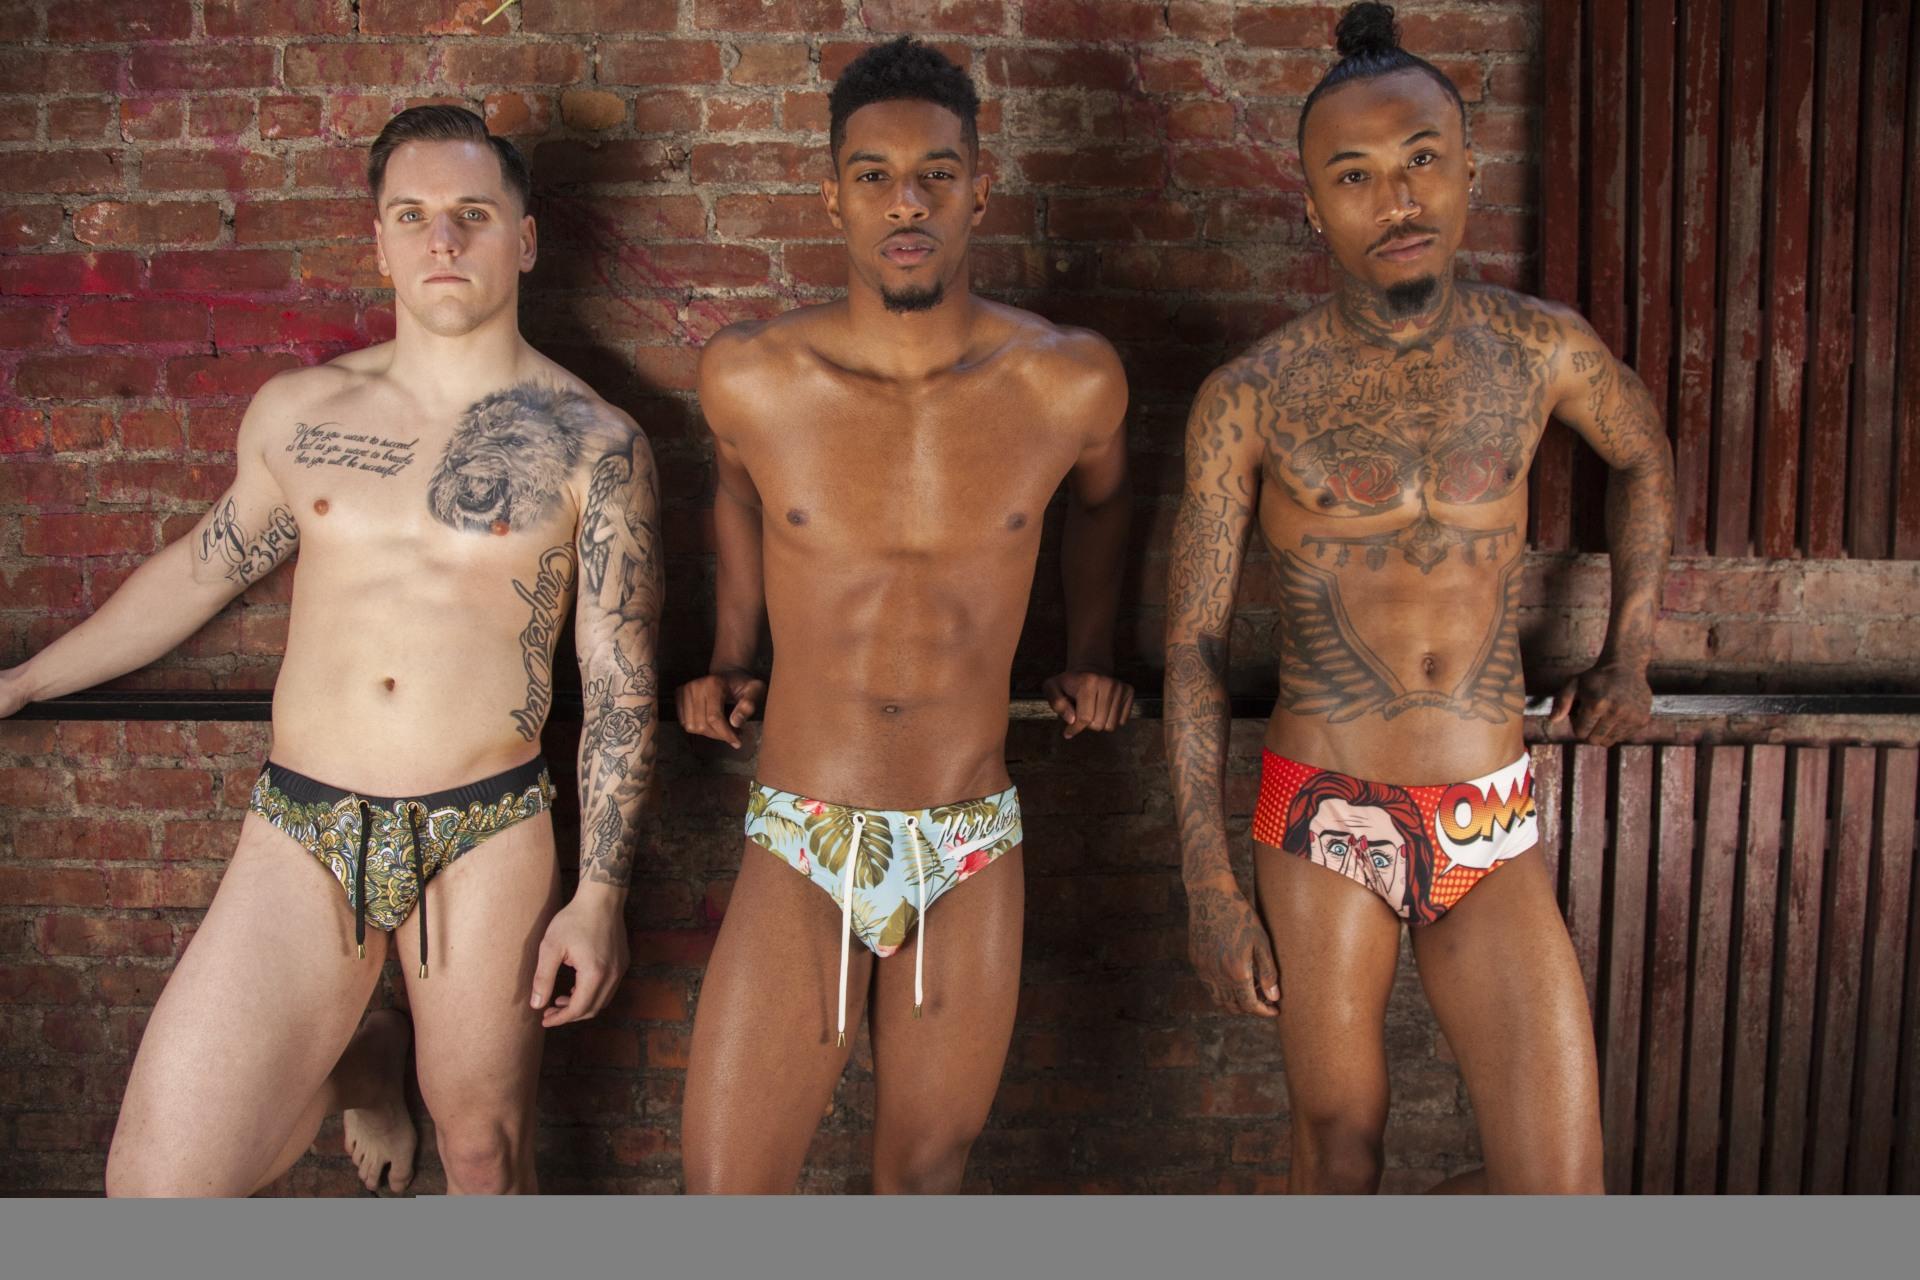 Jeremy, Lessard, Jeremy Lessard, Model, Male Model, Portfolio, Modeling, Jeremy Modeling, Swimsuit, Marcuse, Australia, Jeremy in Swimsuit